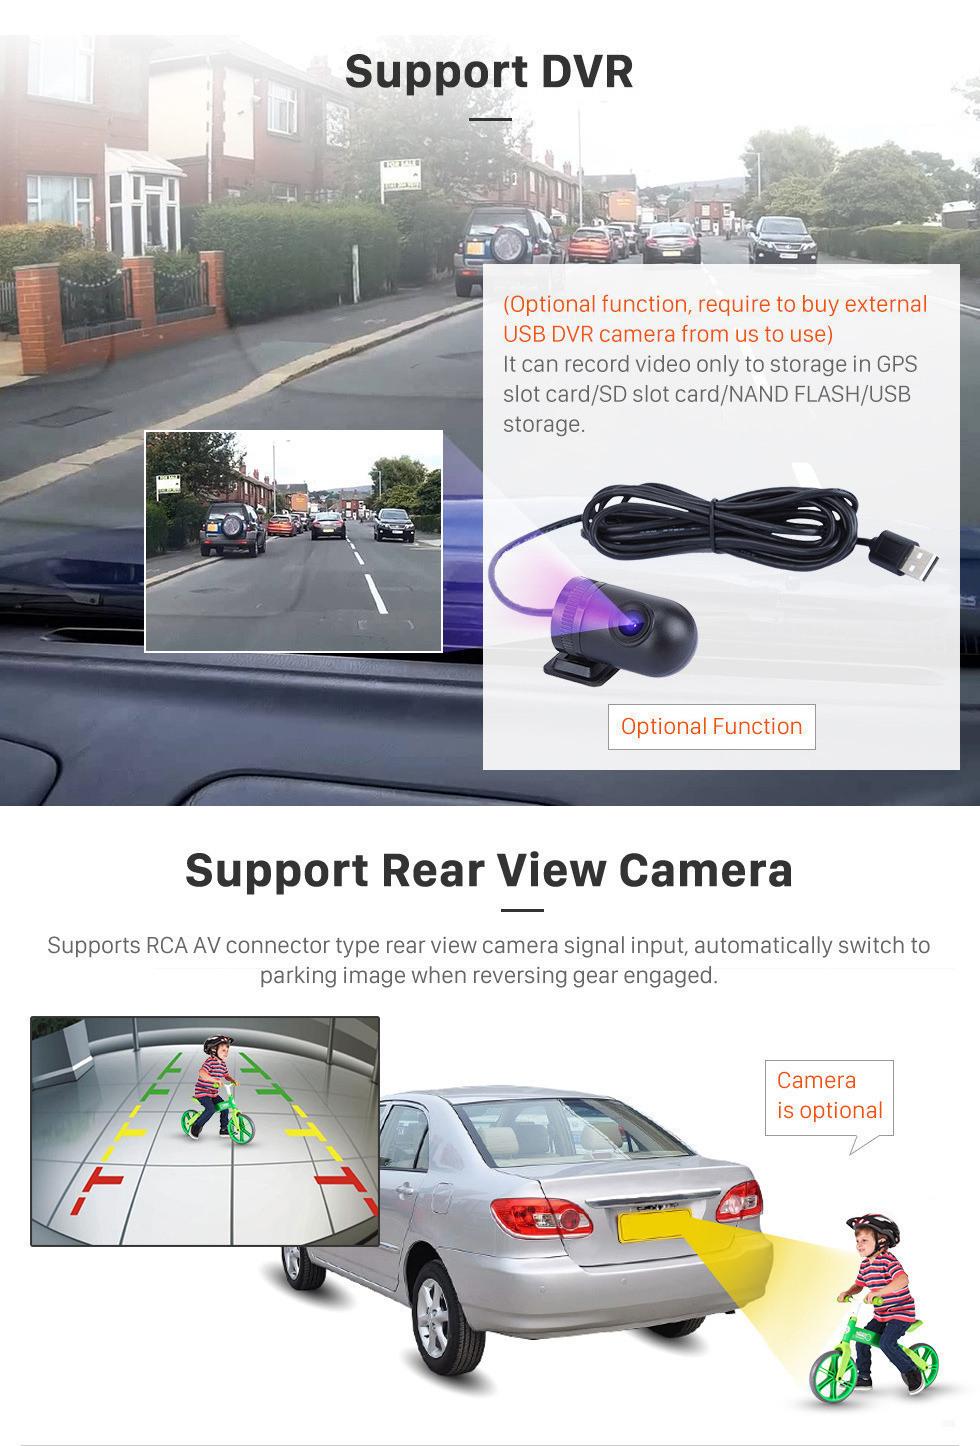 Seicane 9 inch 2011-2016 Renault Captur CLIO Samsung QM3 Auto A/C Aftermarket GPS Navigation System HD touch Screen Car Radio Bluetooth Support OBD2 4G WiFi DVR Mirror Link